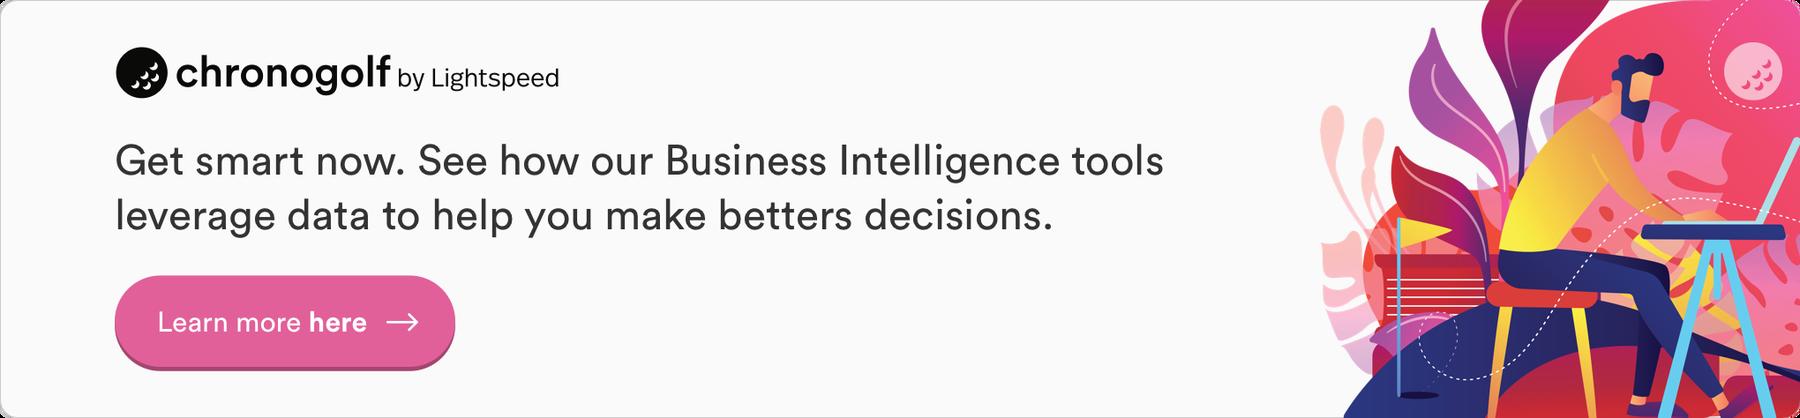 business-intelligence-chronogolf